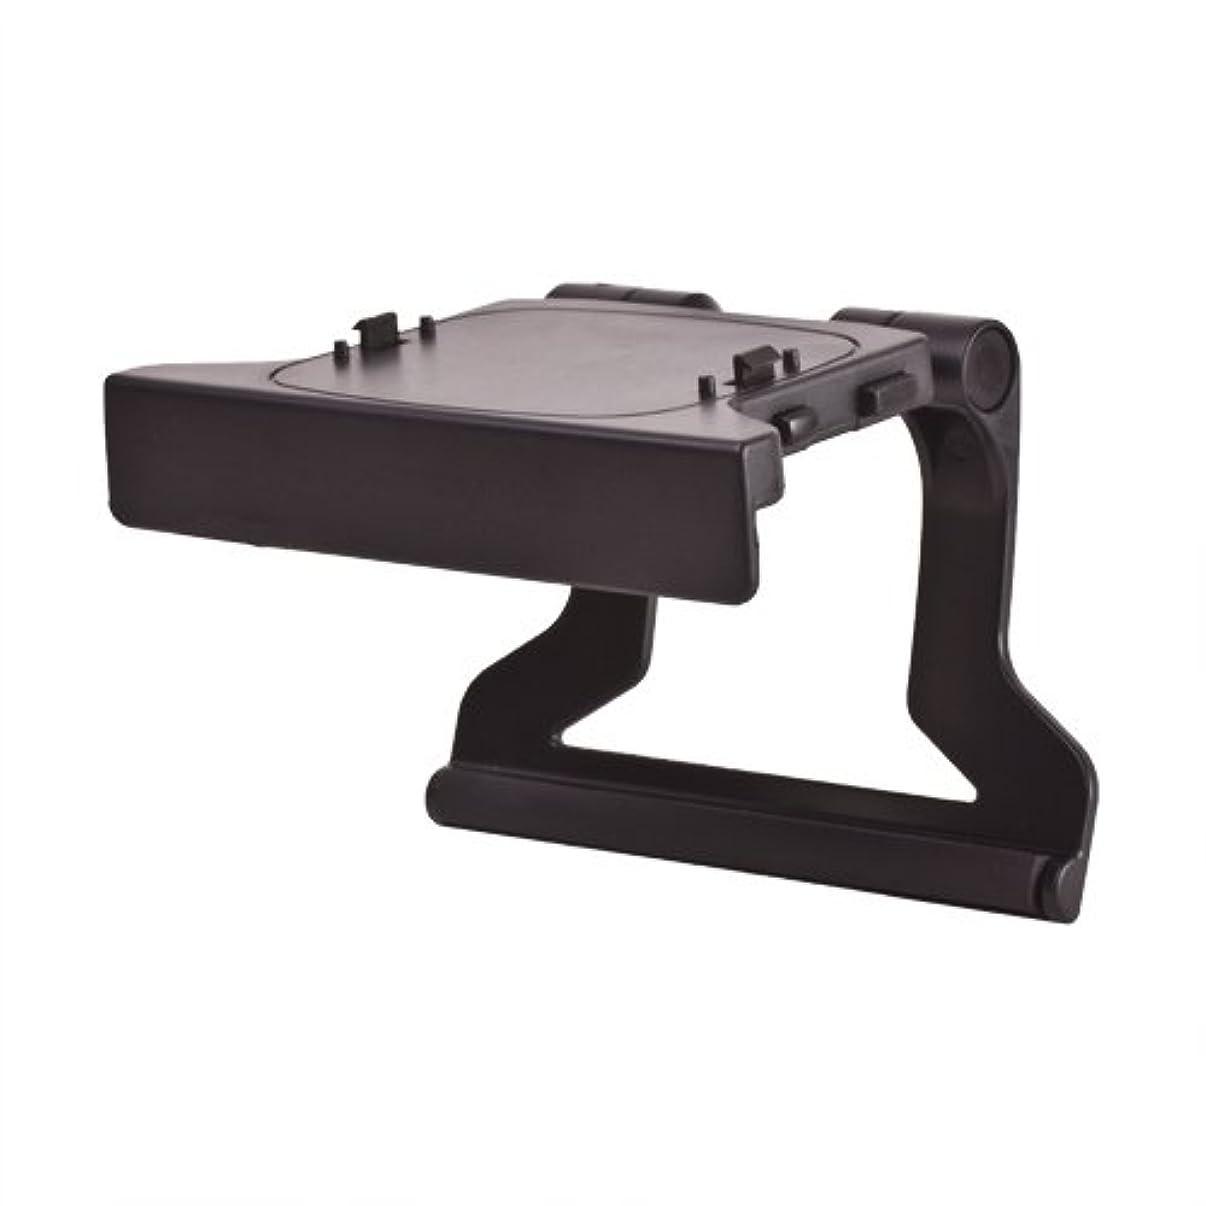 TNP Xbox 360 TV Mount Clip Mounting Stand Holder Cradle Dock Bracket (Black) for Microsoft Xbox 360 Kinect Sensor Camera [Xbox 360]